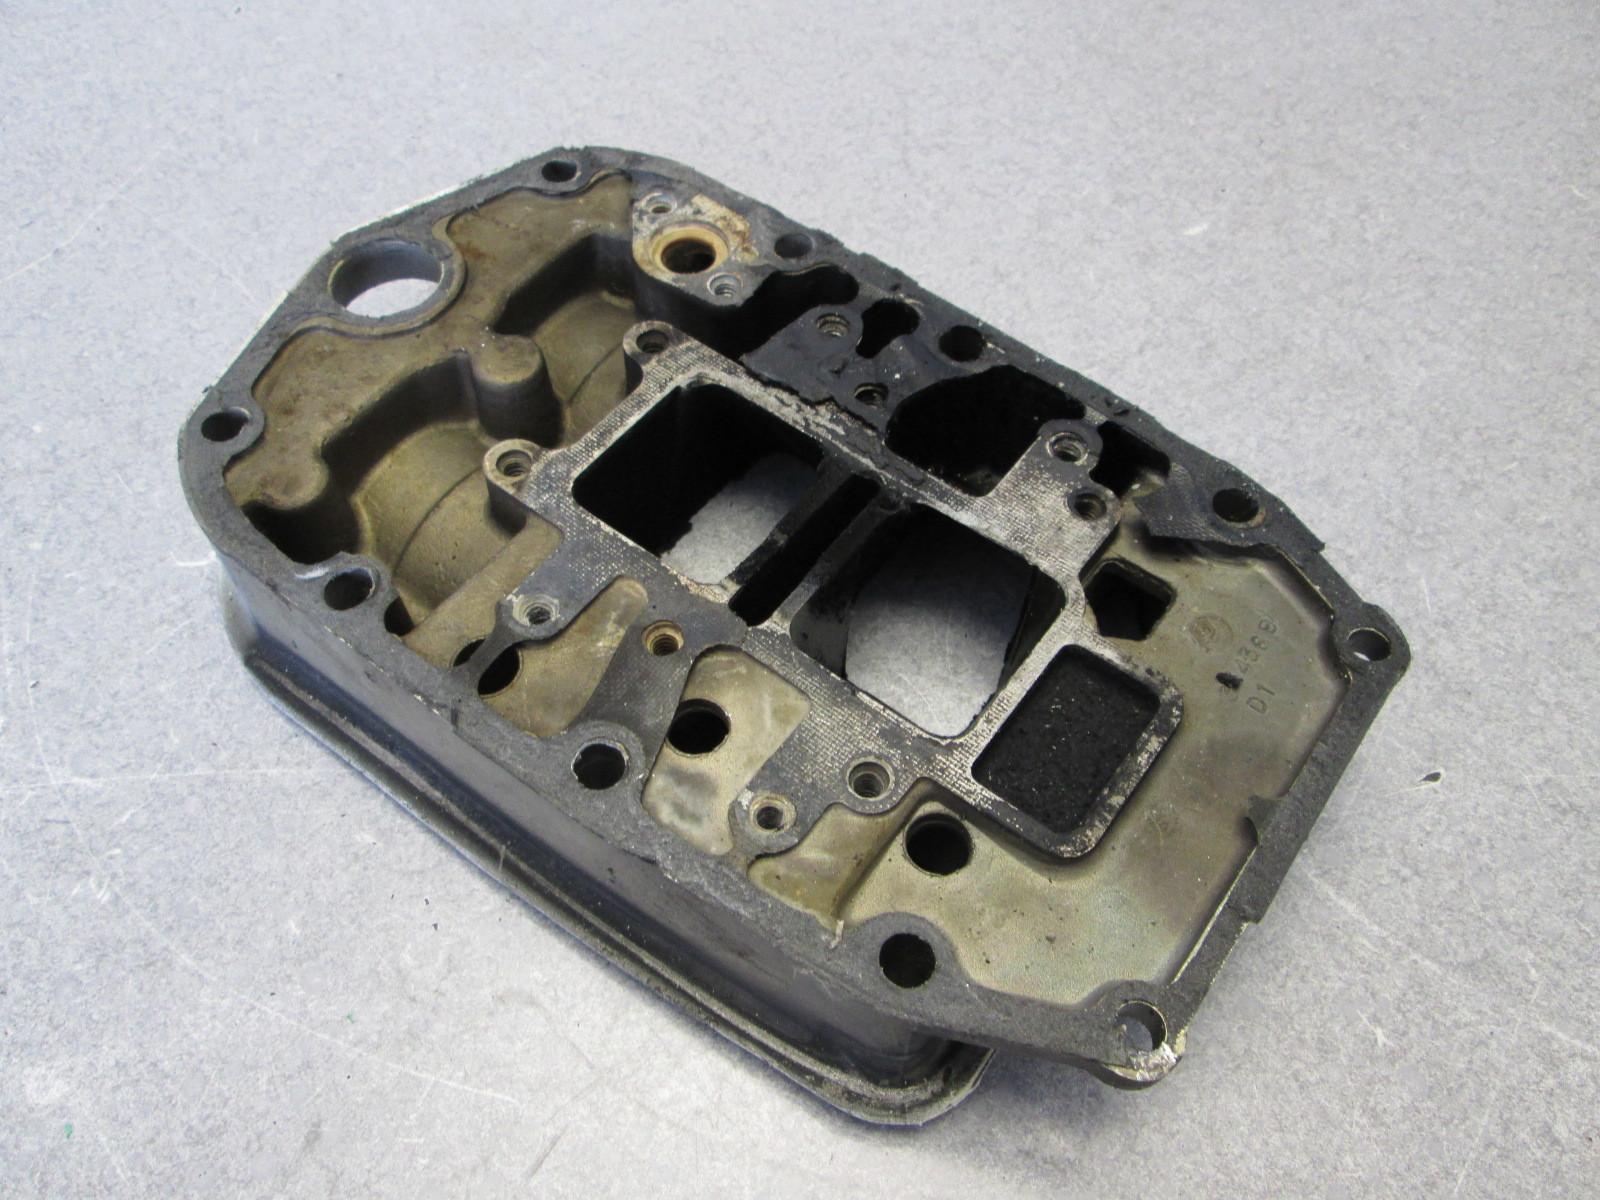 334369 0351178 Evinrude Johnson 40 45 50 55 Hp Exhaust Adapter Plate